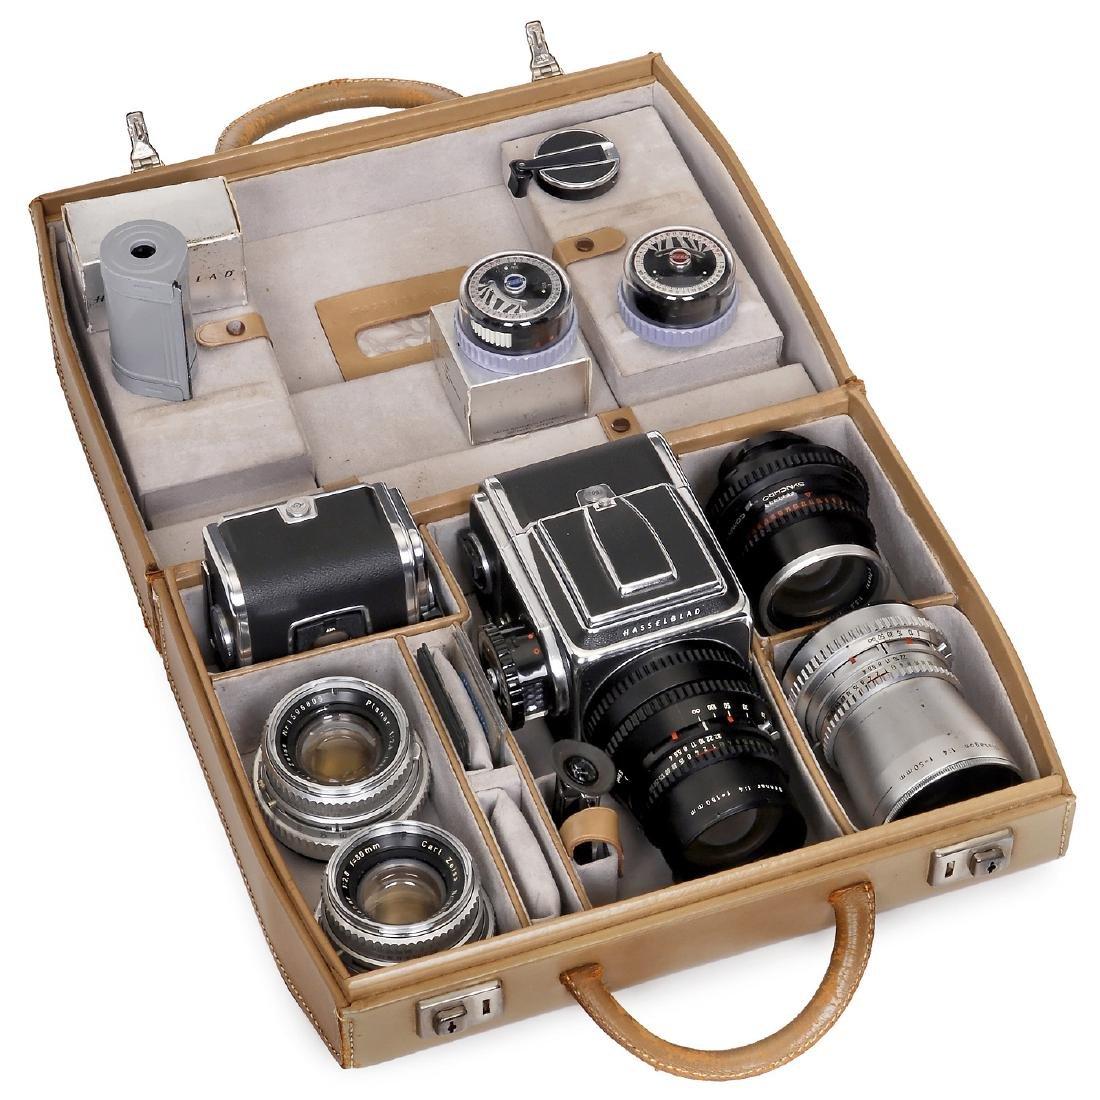 Hasselblad 500C with Lenses - 2